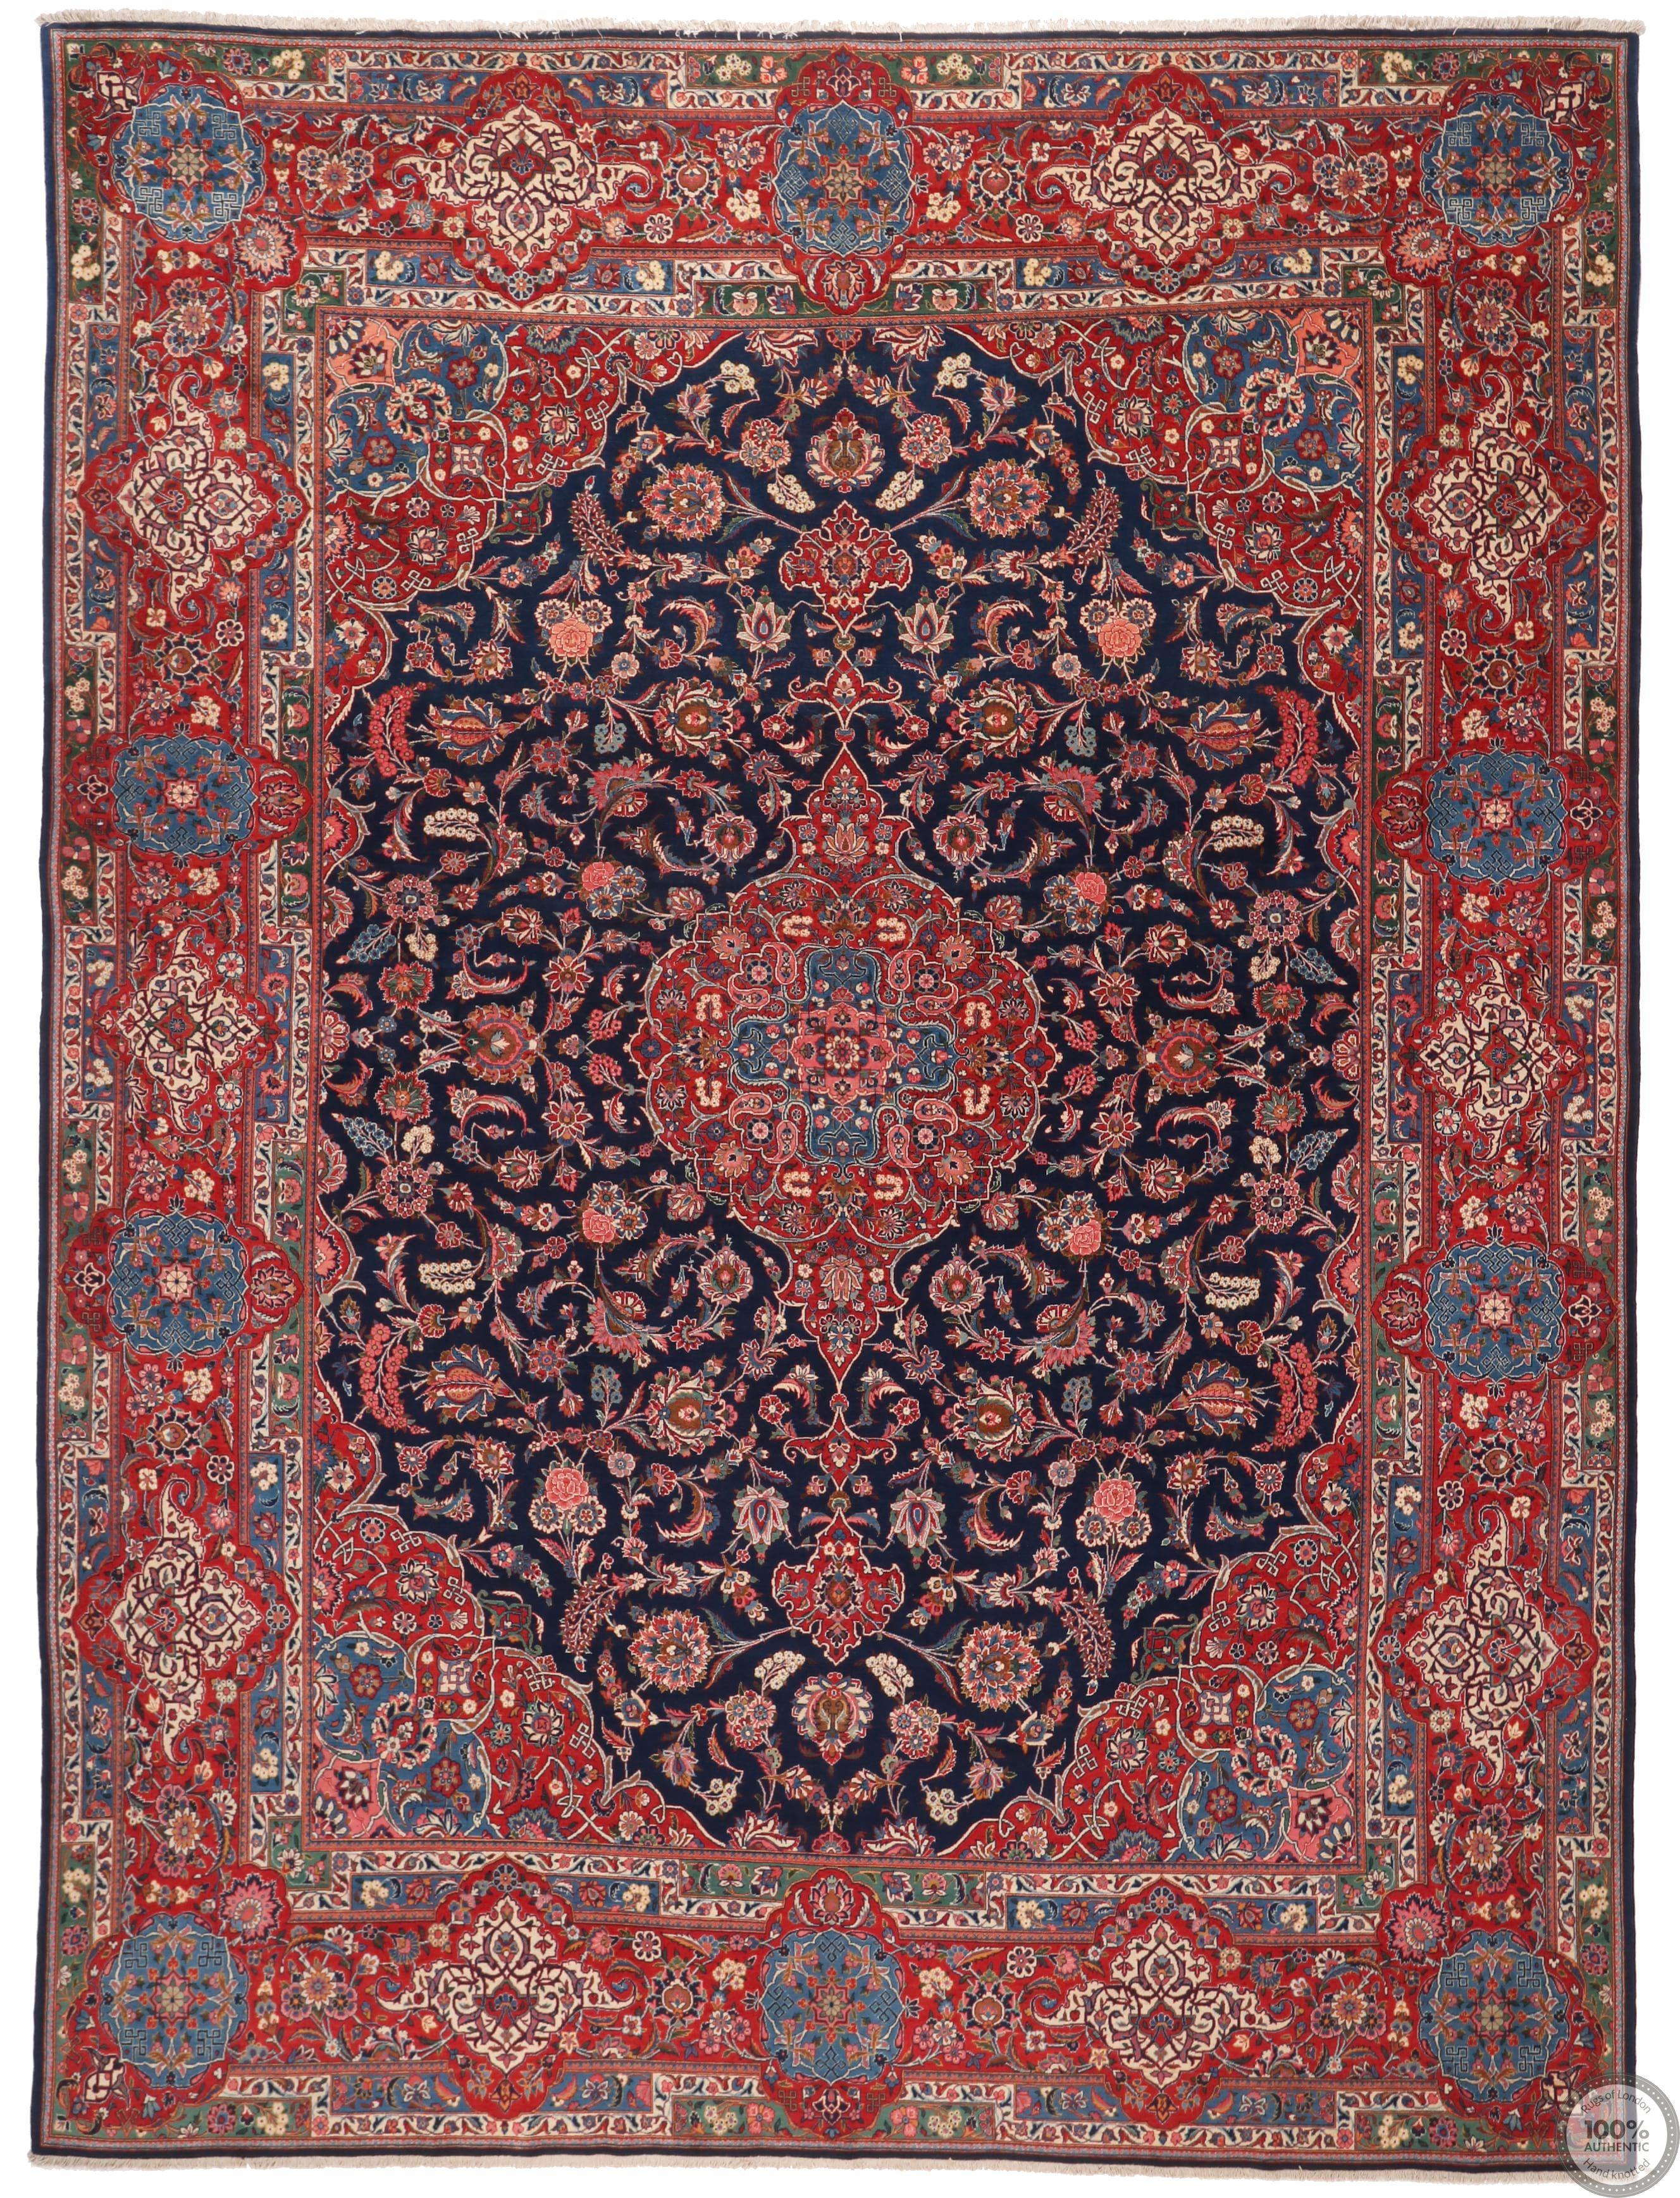 Antique Fine Persian Kashan Rug - 13.4 x 10.1